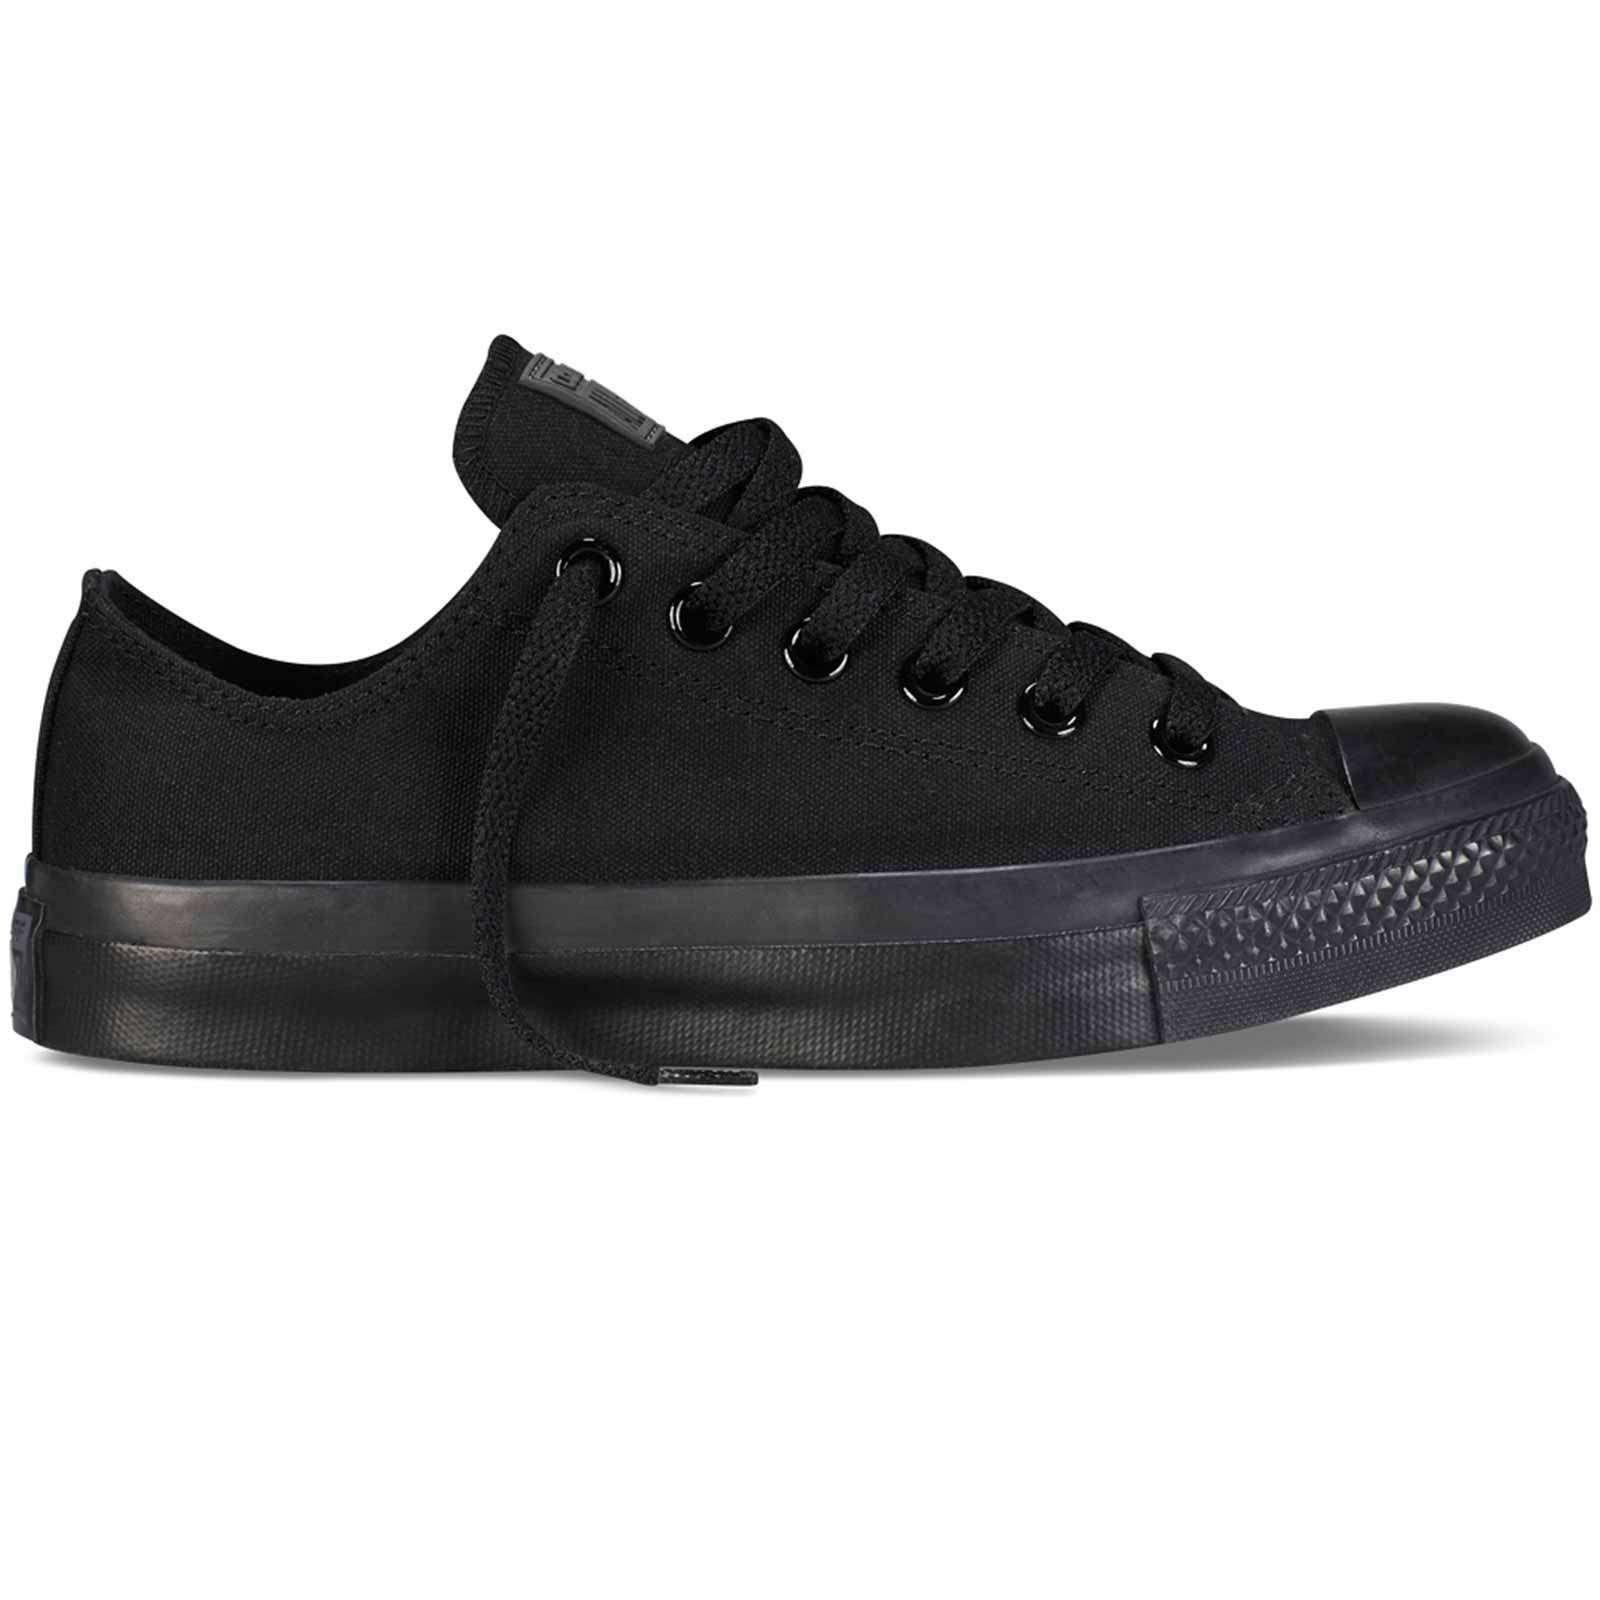 zapatillas CONVERSE Chuck TaylorAll Star zapatos Basse hombres mujer M5039C negro